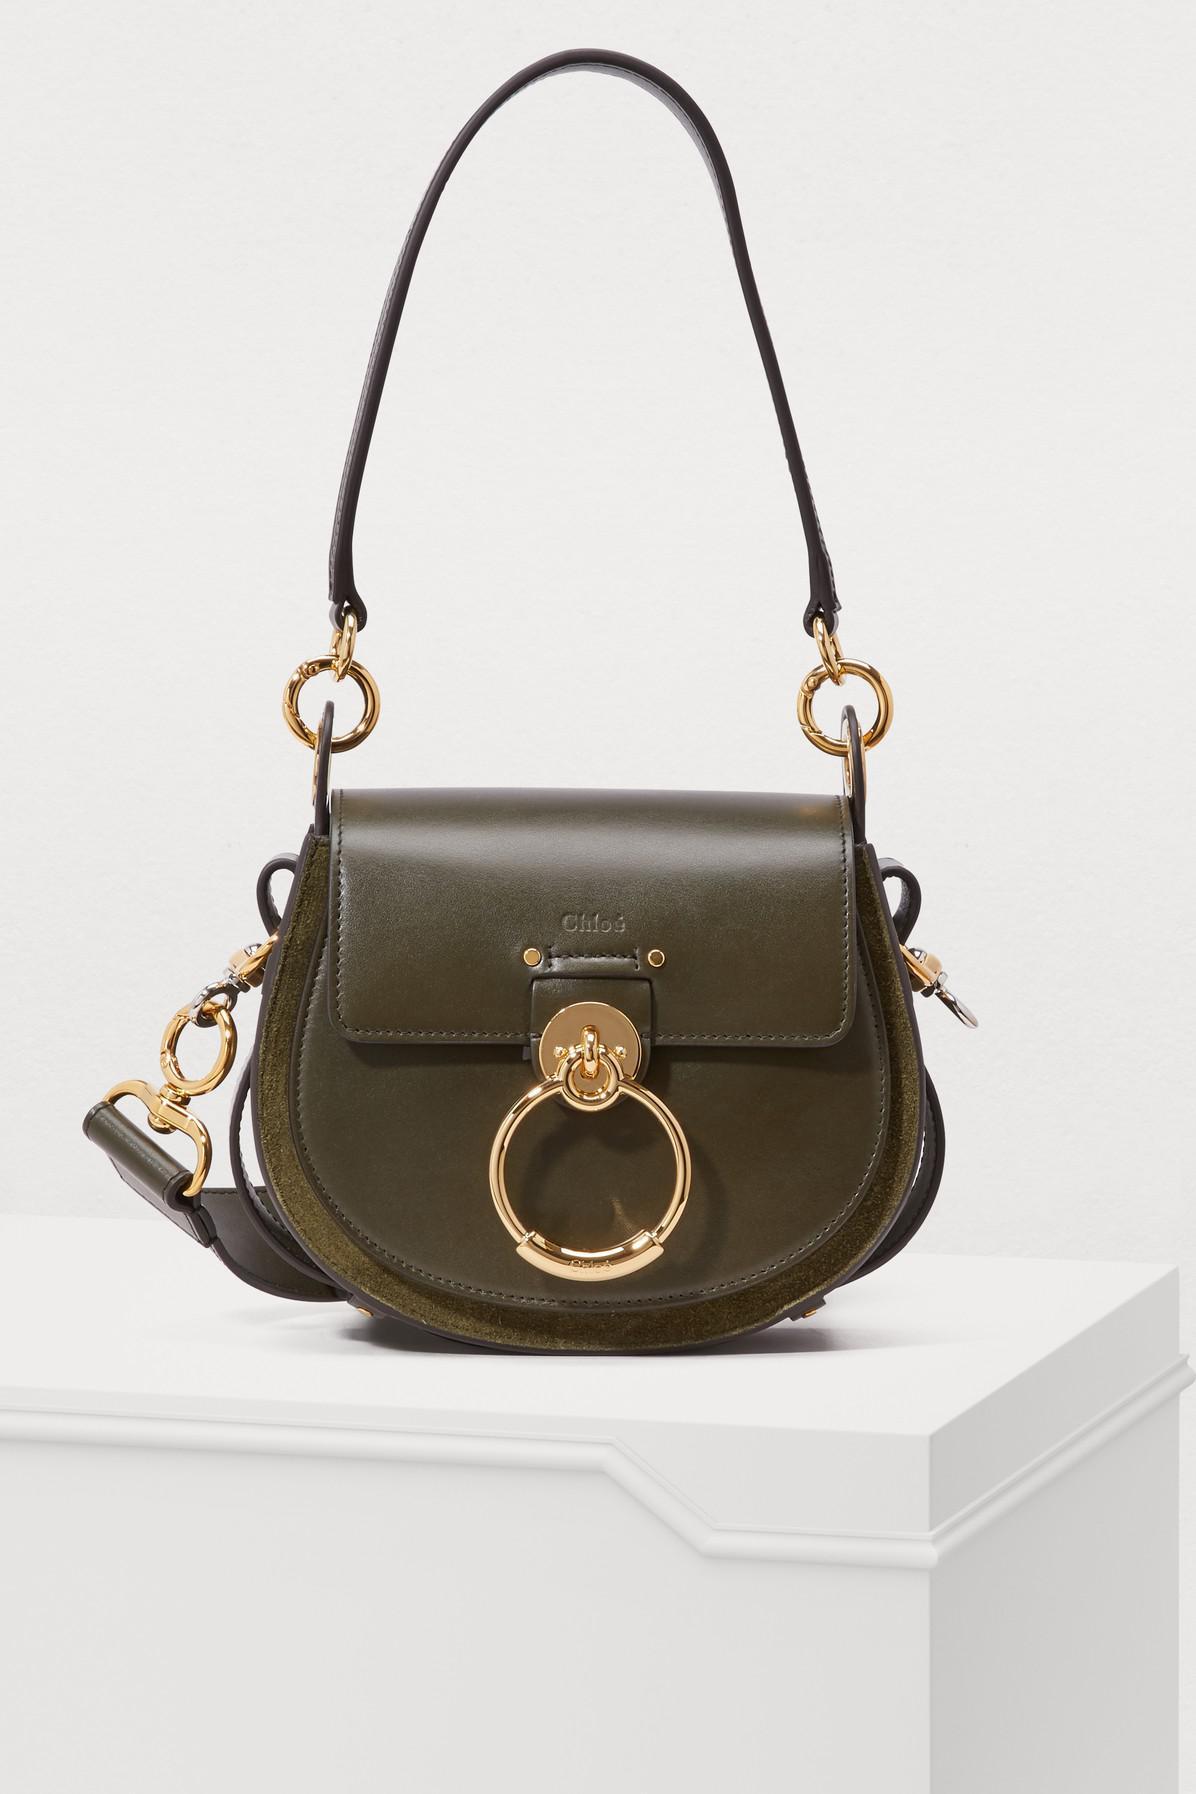 0d164498 Chloé Multicolor Small Tess Bag